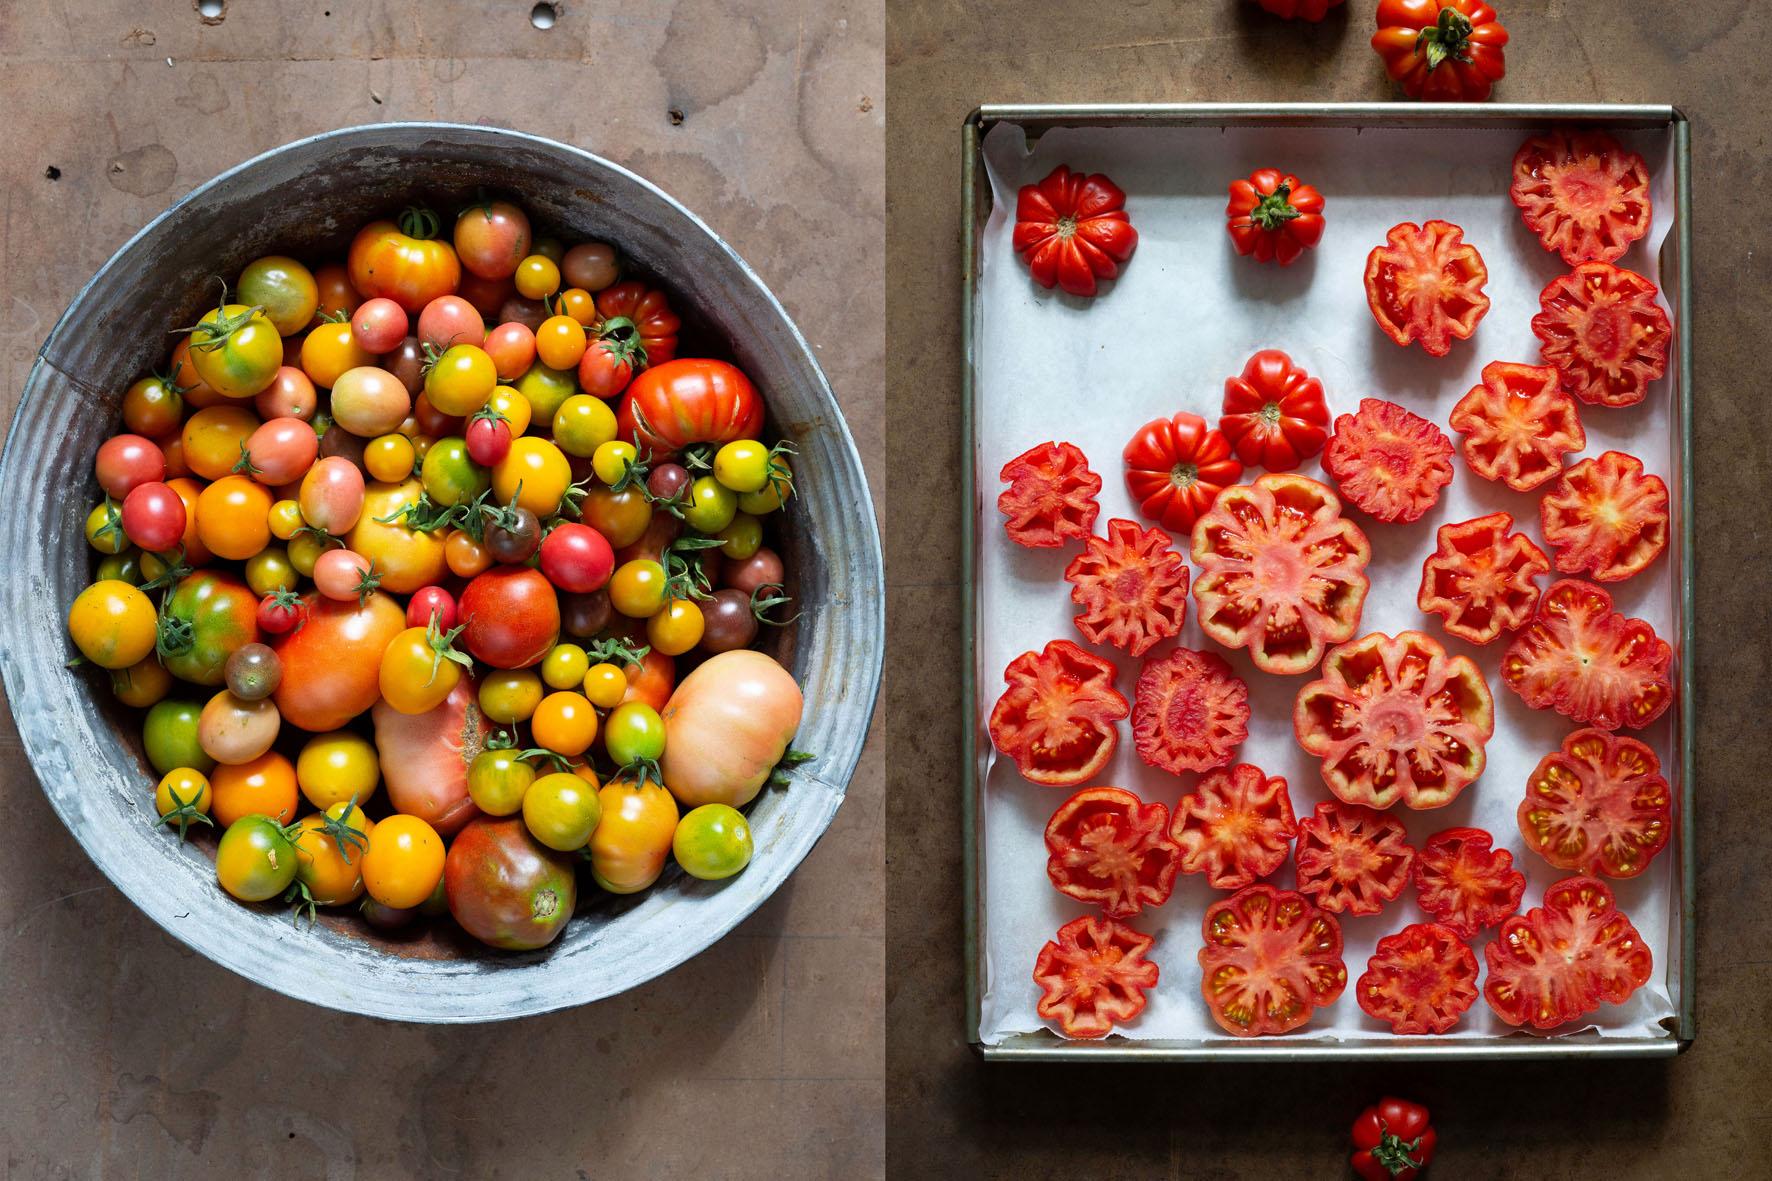 skogtillbord-tomater-torkade-sept20